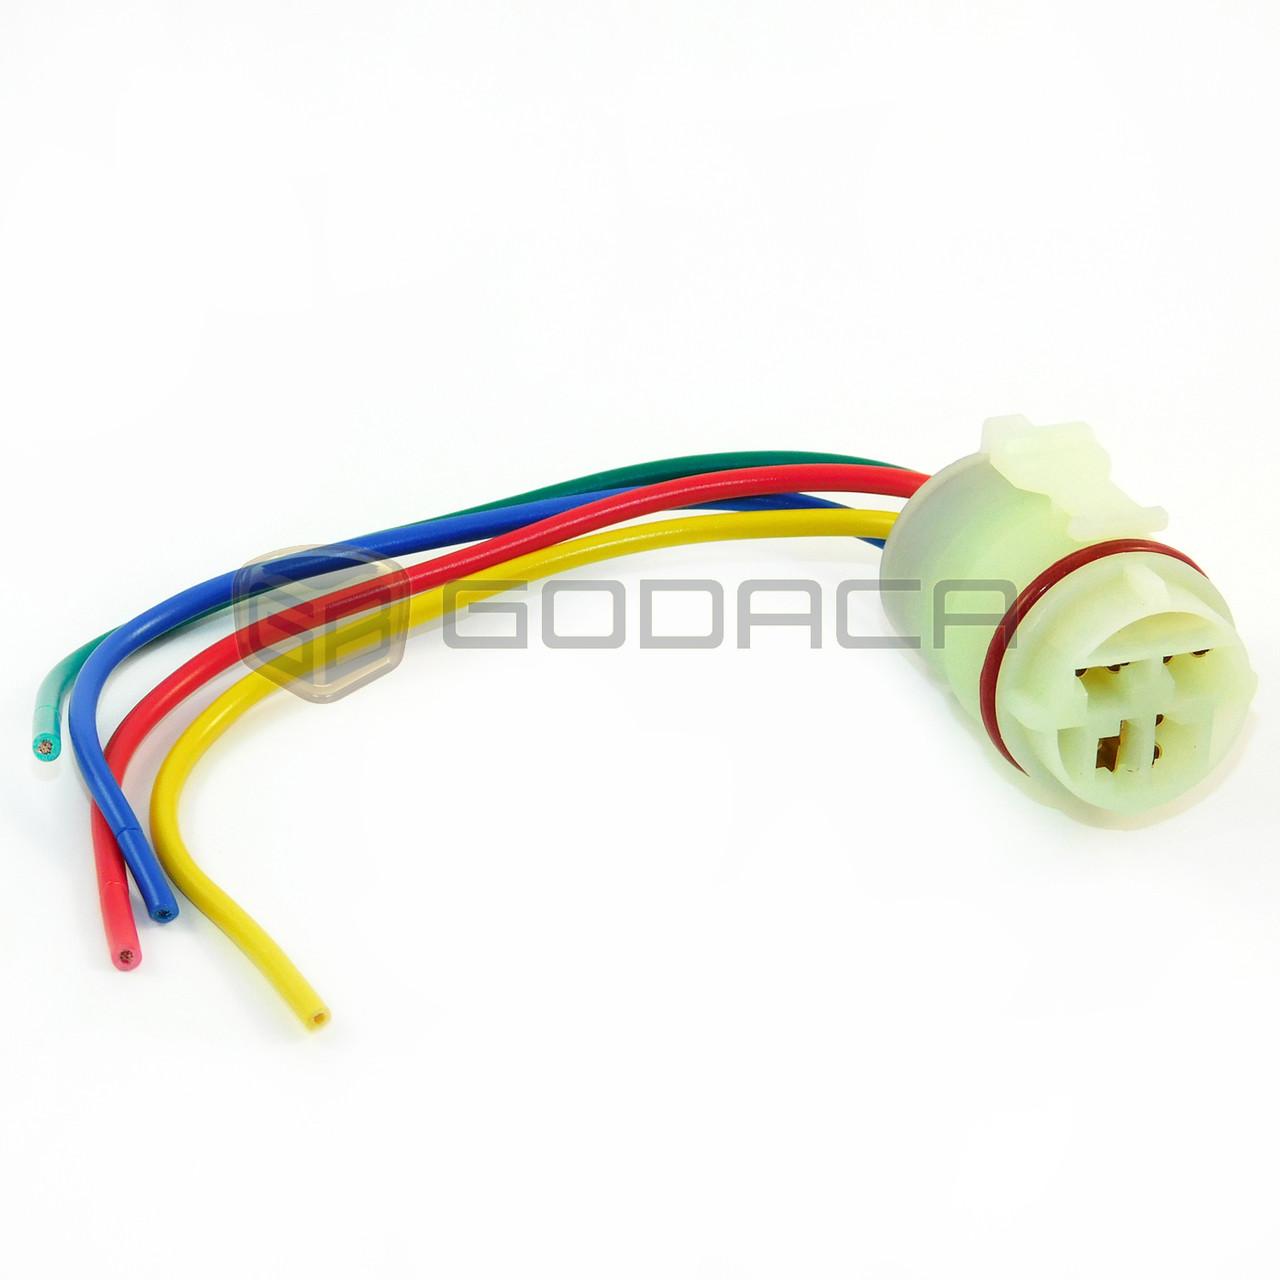 medium resolution of 1 x 4 way connector alternator repair plug harness universal for gm chevrolet godaca llc